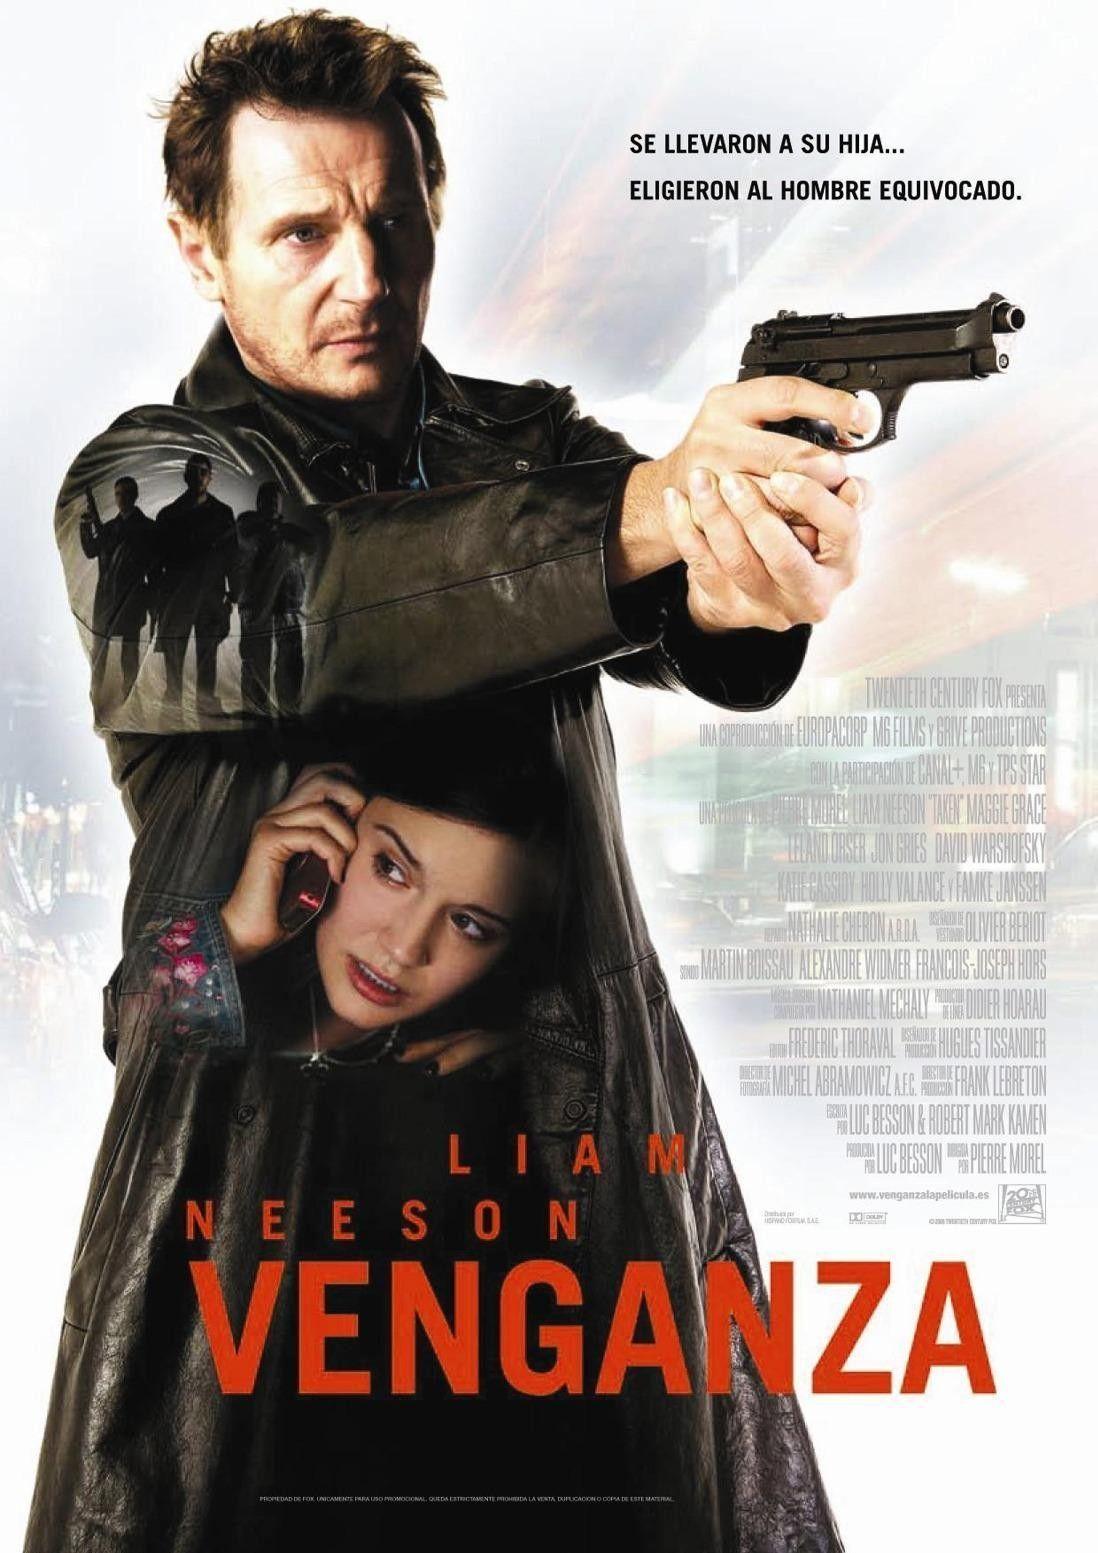 Ver Venganza Online Gratis 2008 Hd Pelicula Completa Espanol Full Movies Full Movies Online Free Streaming Movies Online